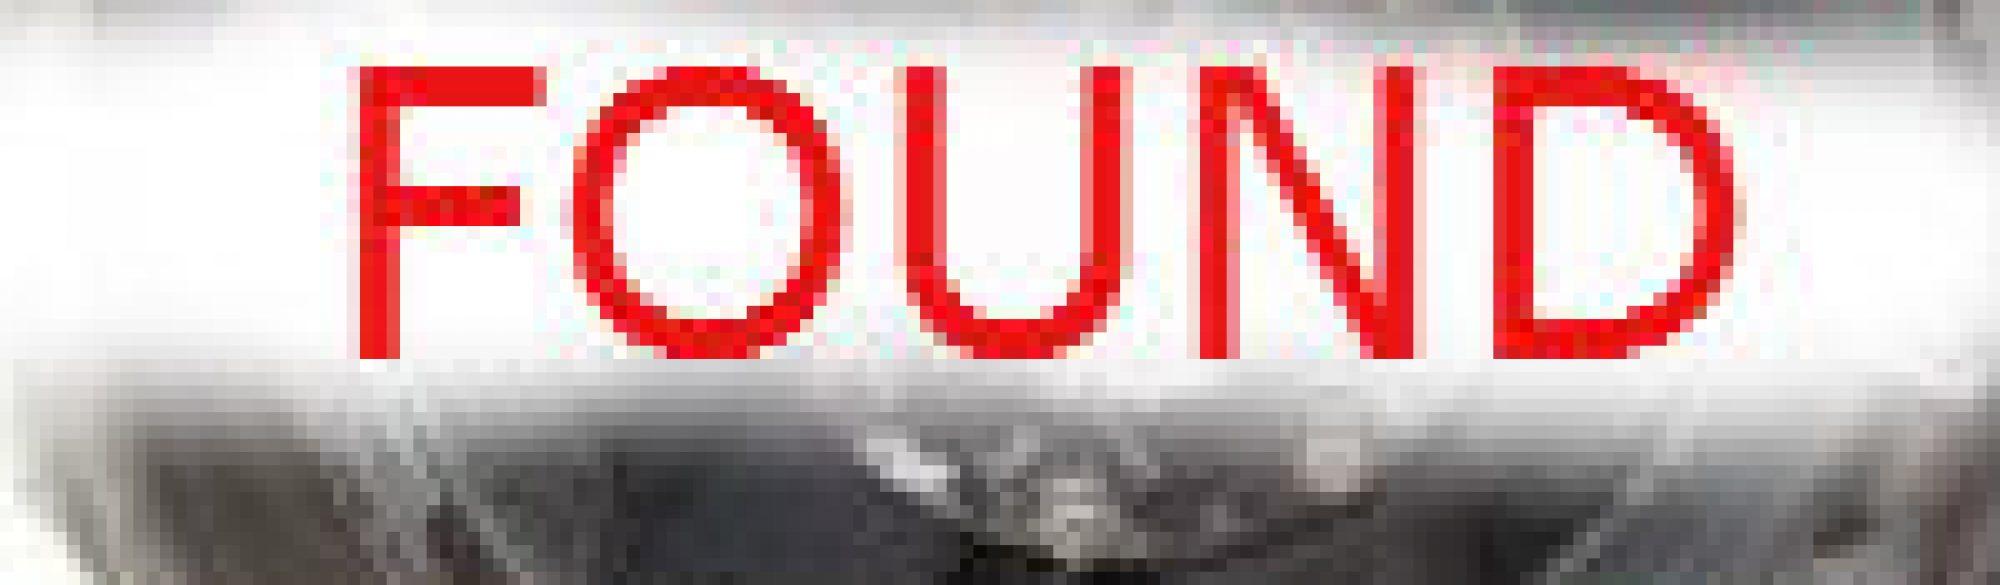 DAYTON-HUB-RX277-150x150 FOUND